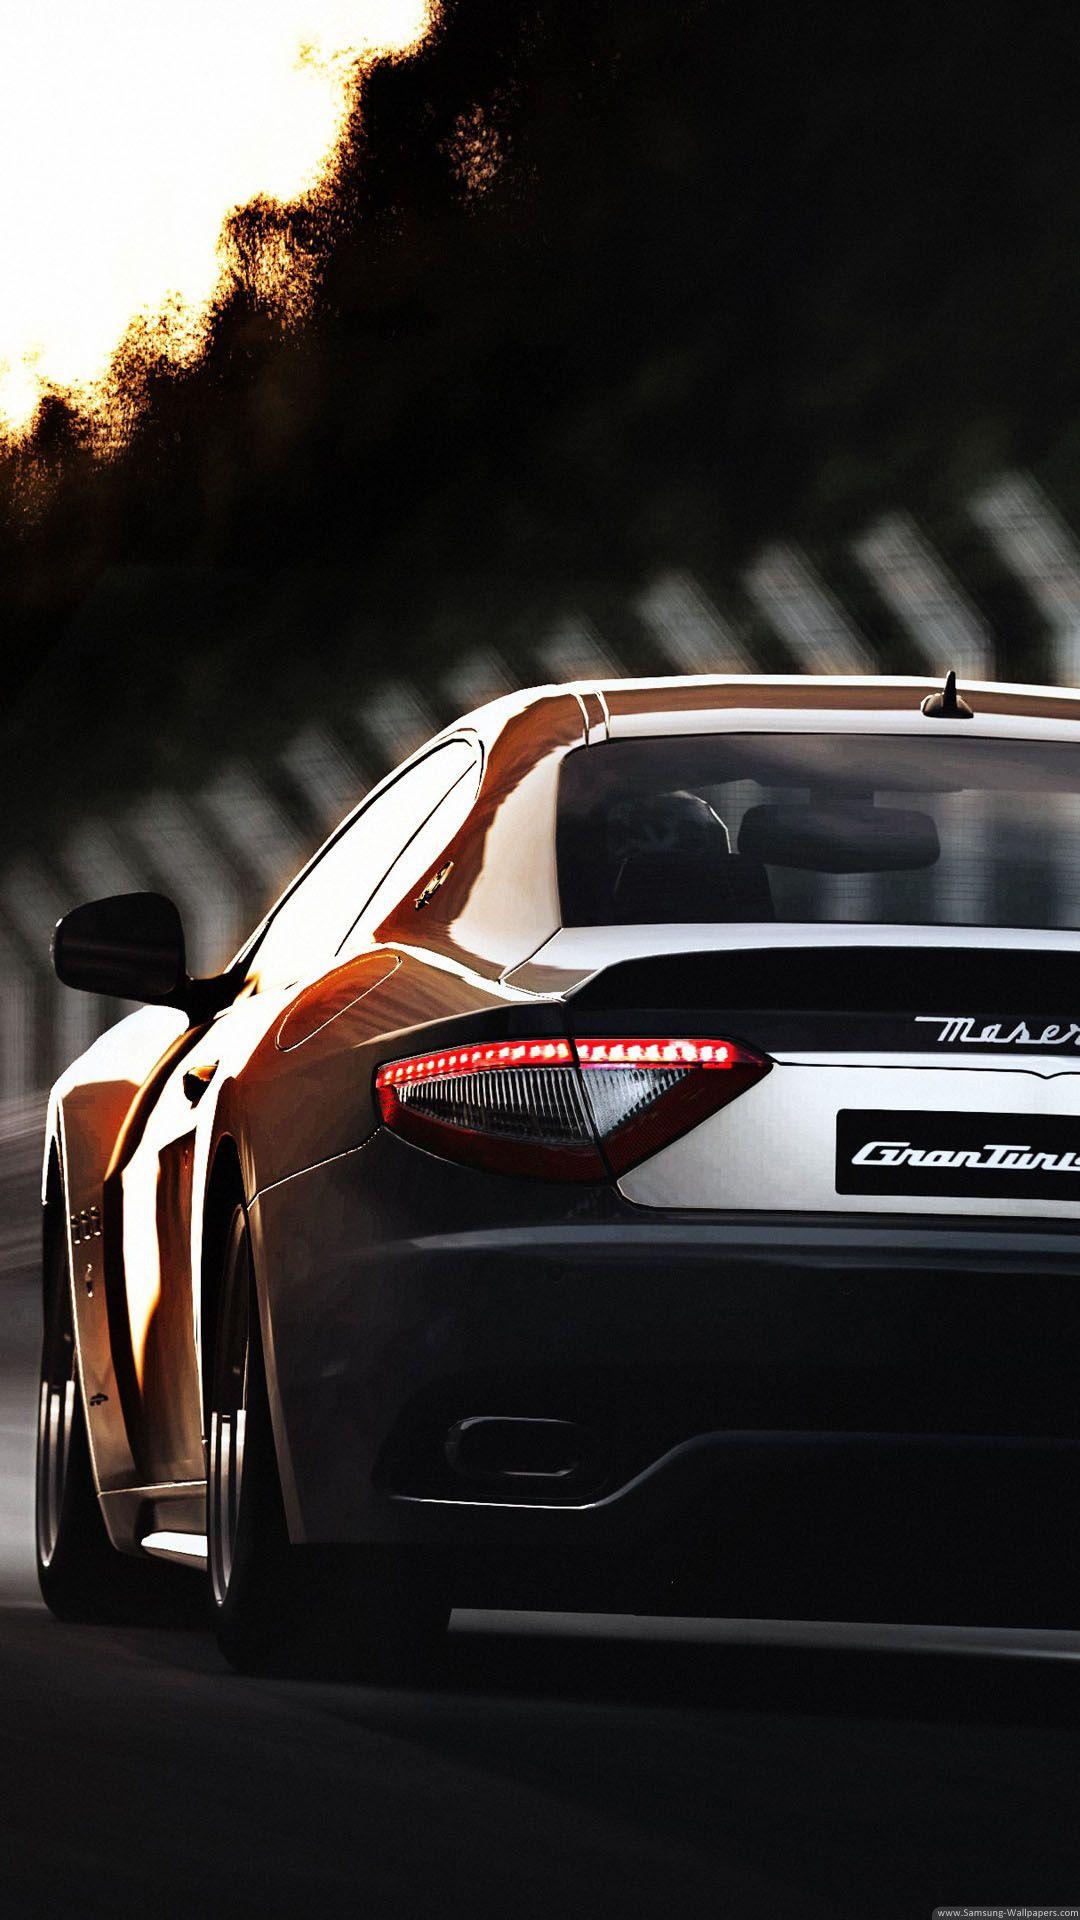 Cars Backview Vehicles Supercars Lamborghini Gallardo Black Cars